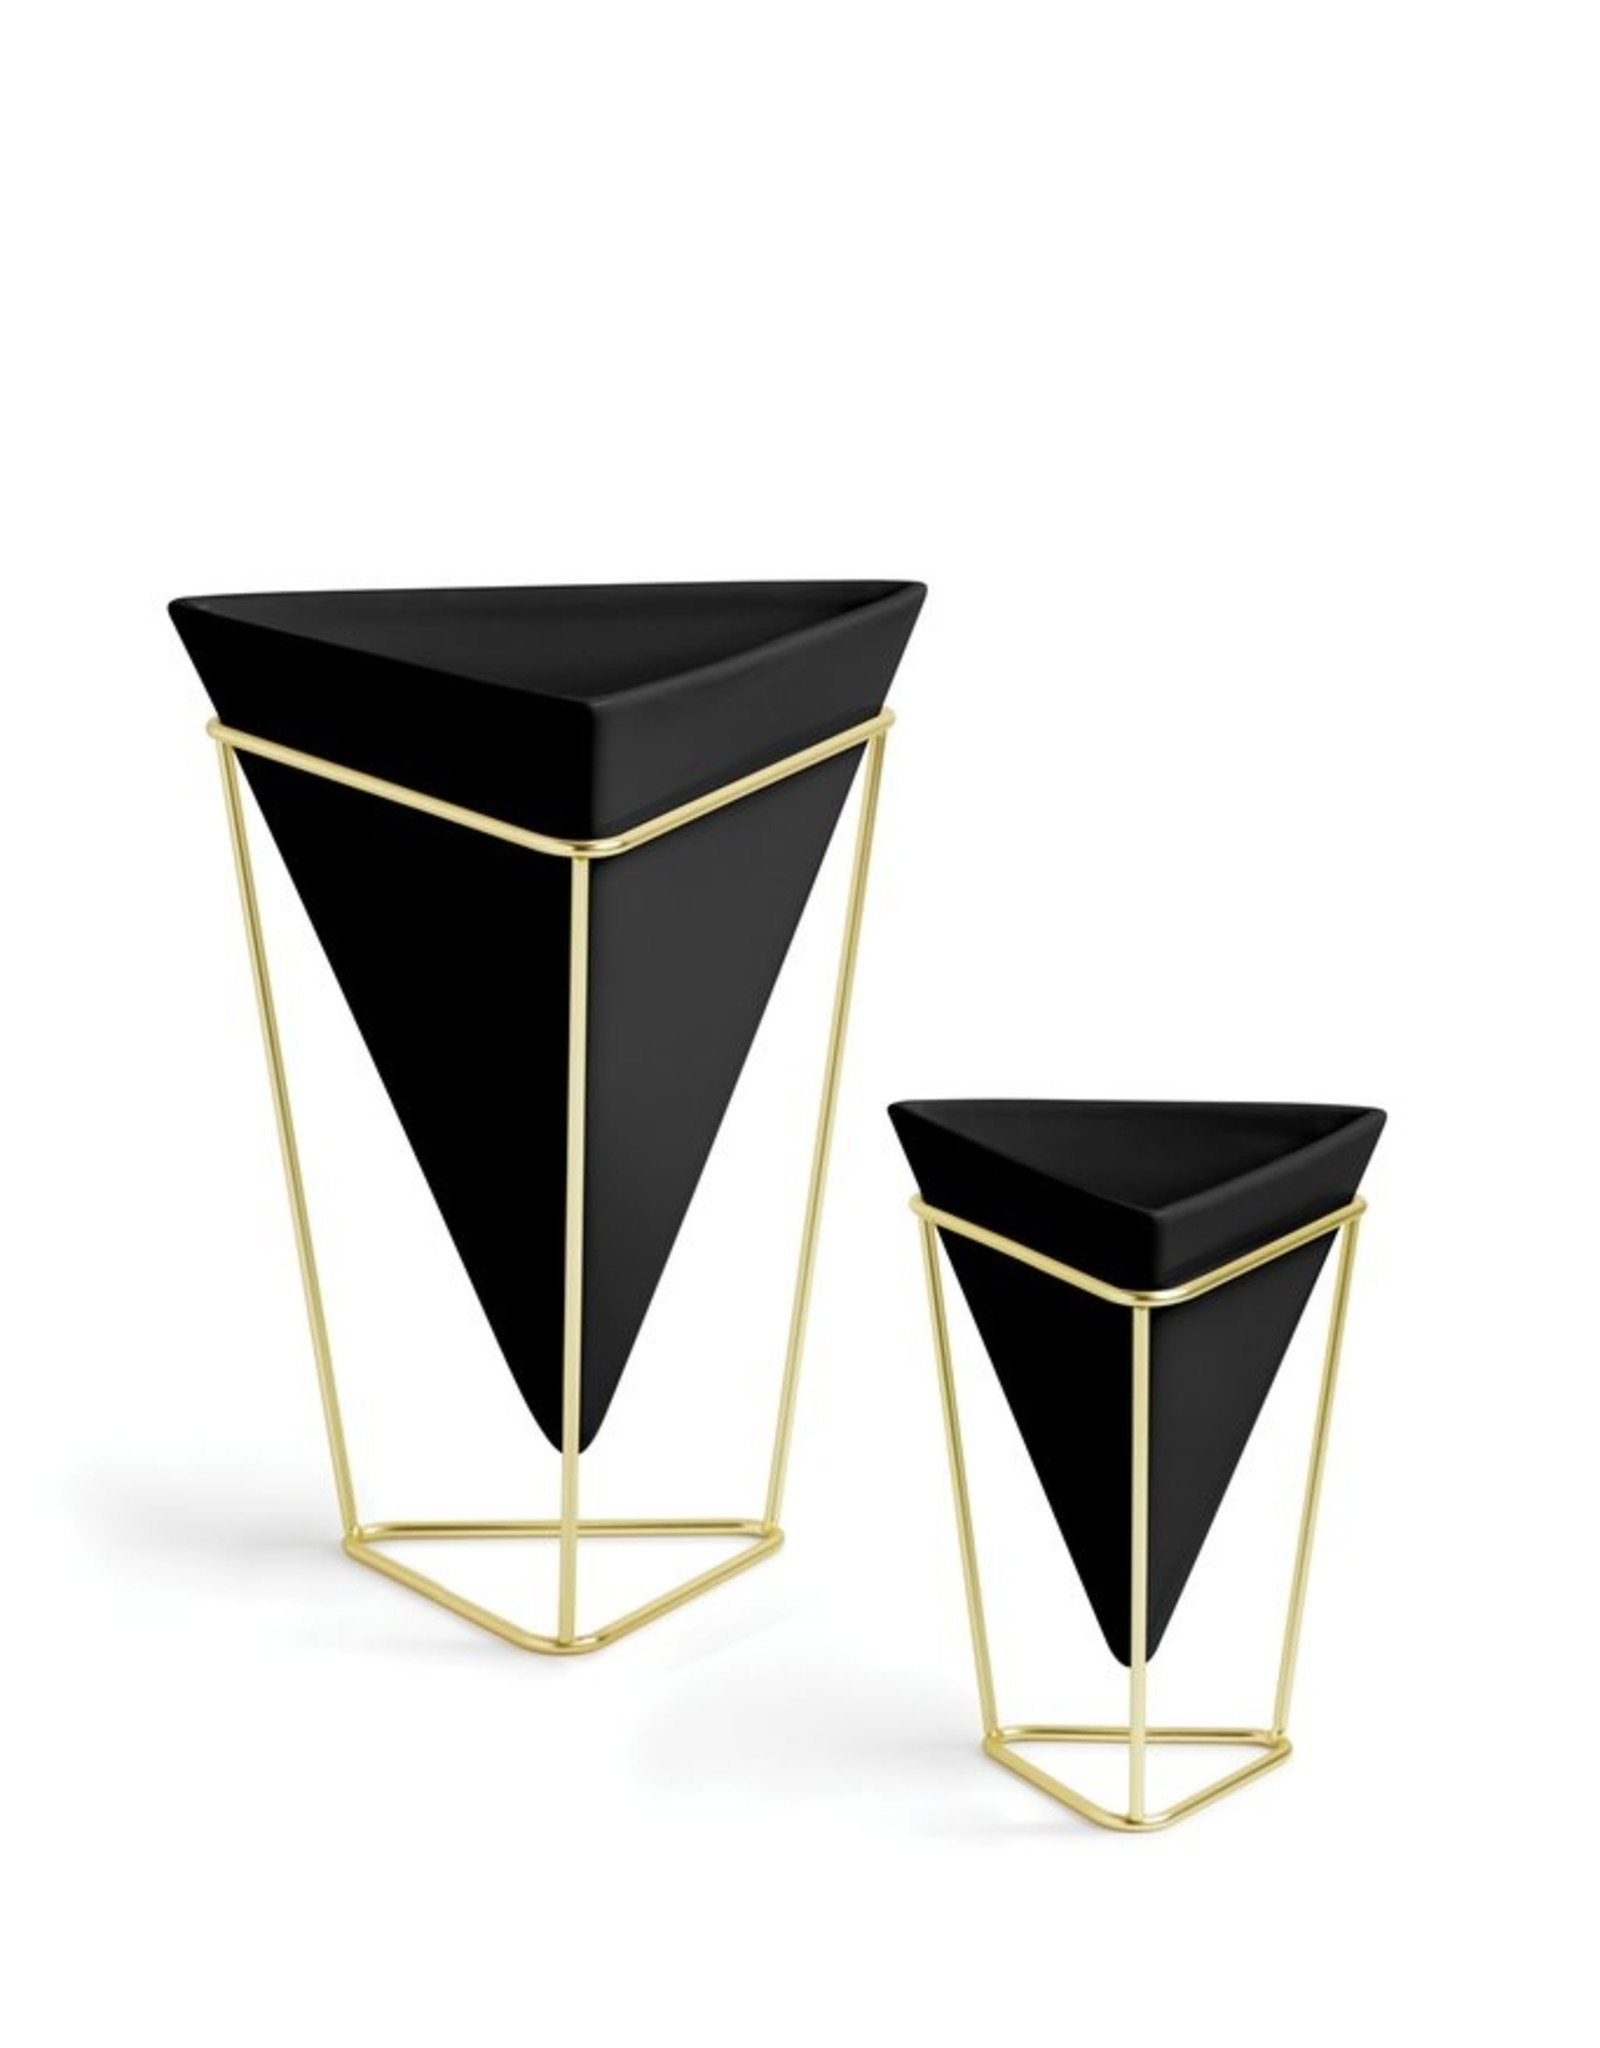 Umbra Umbra-Trigg desk set Black - brass